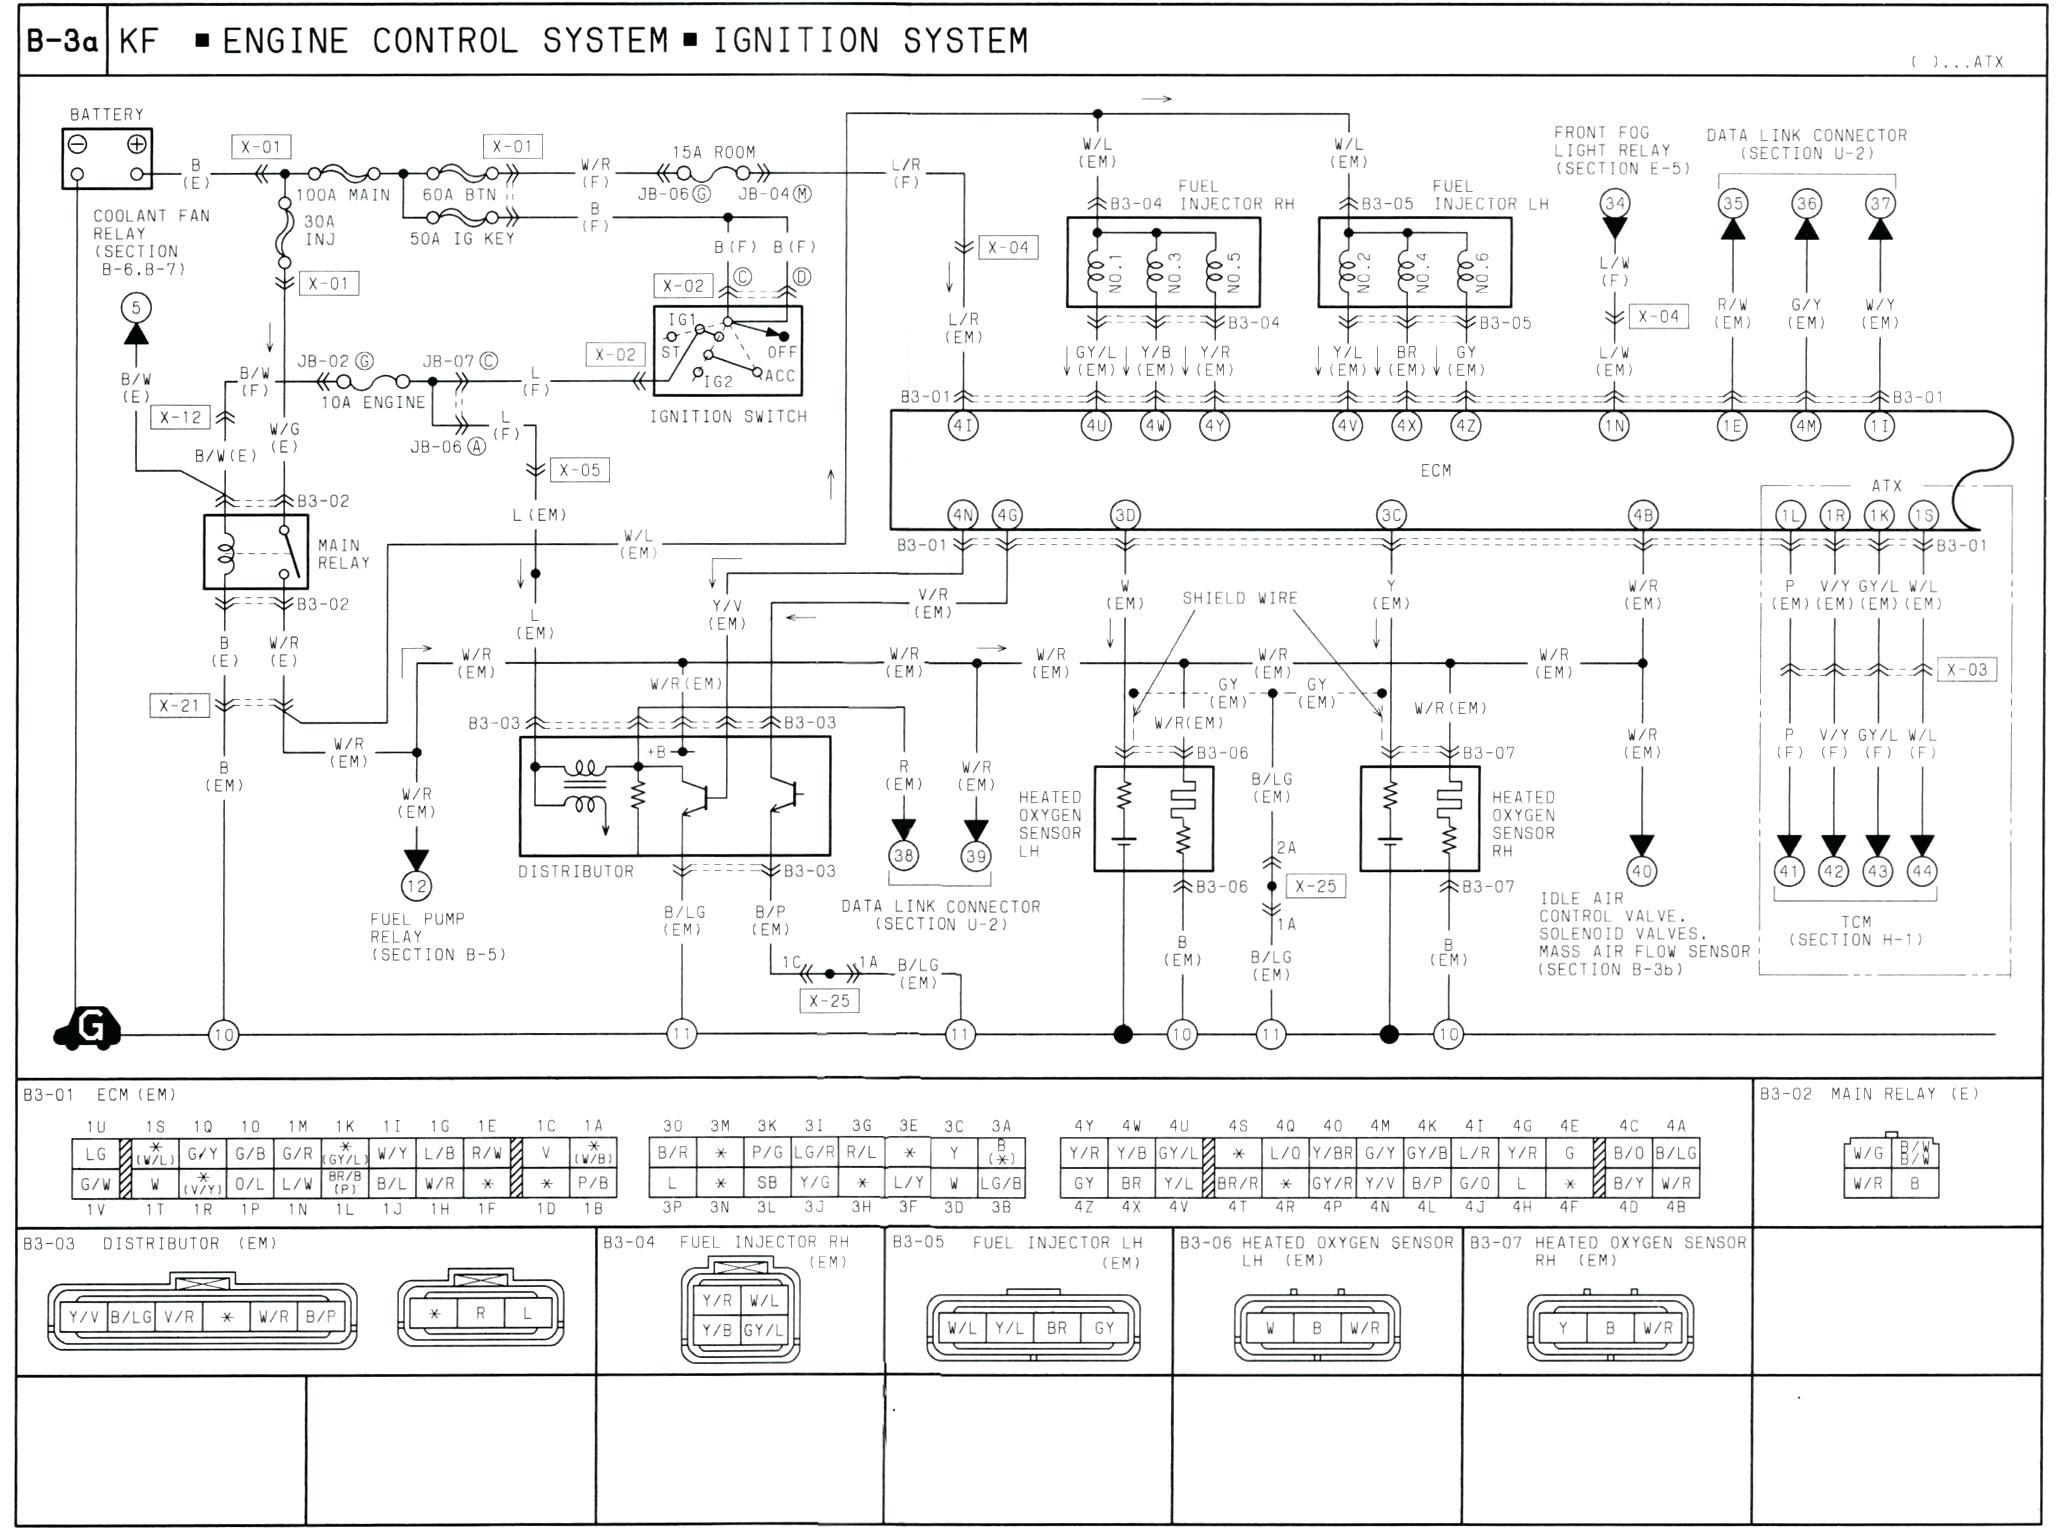 Mazda 626 Engine Diagram 1988 Lovely 2058x1530